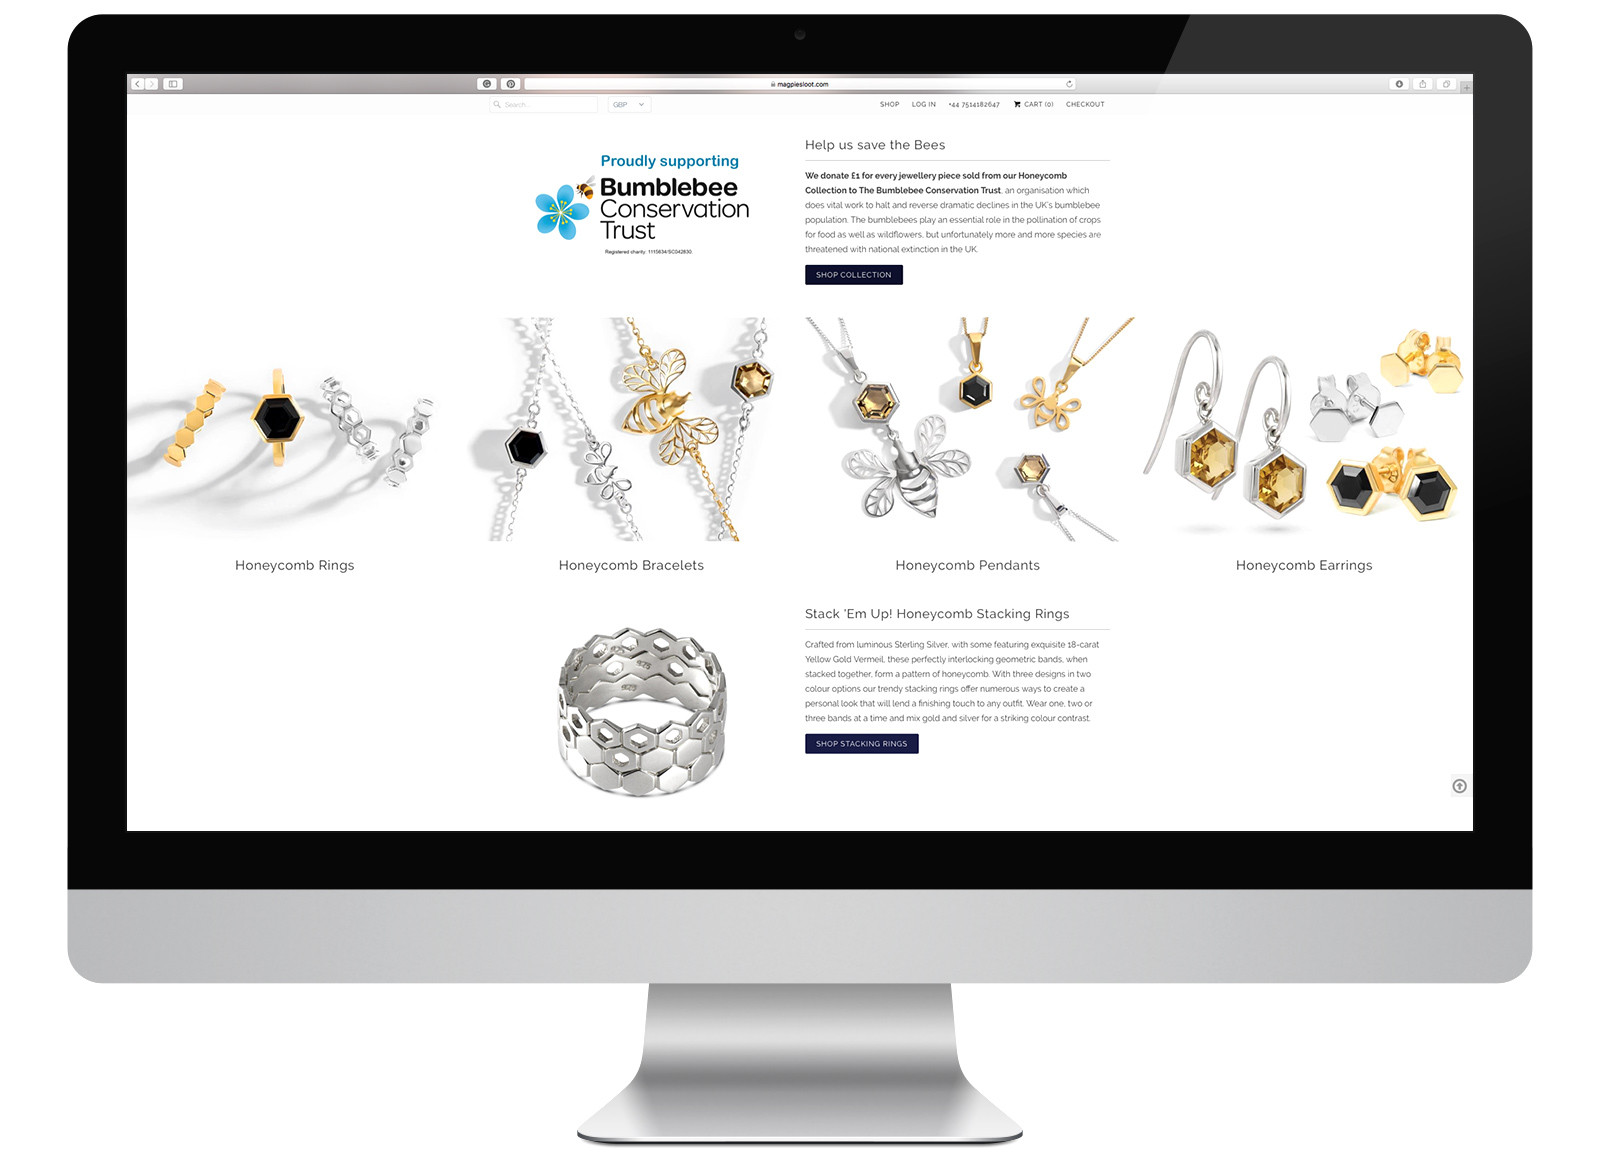 magpies-loot-webdesign-4-martin-marcin-r